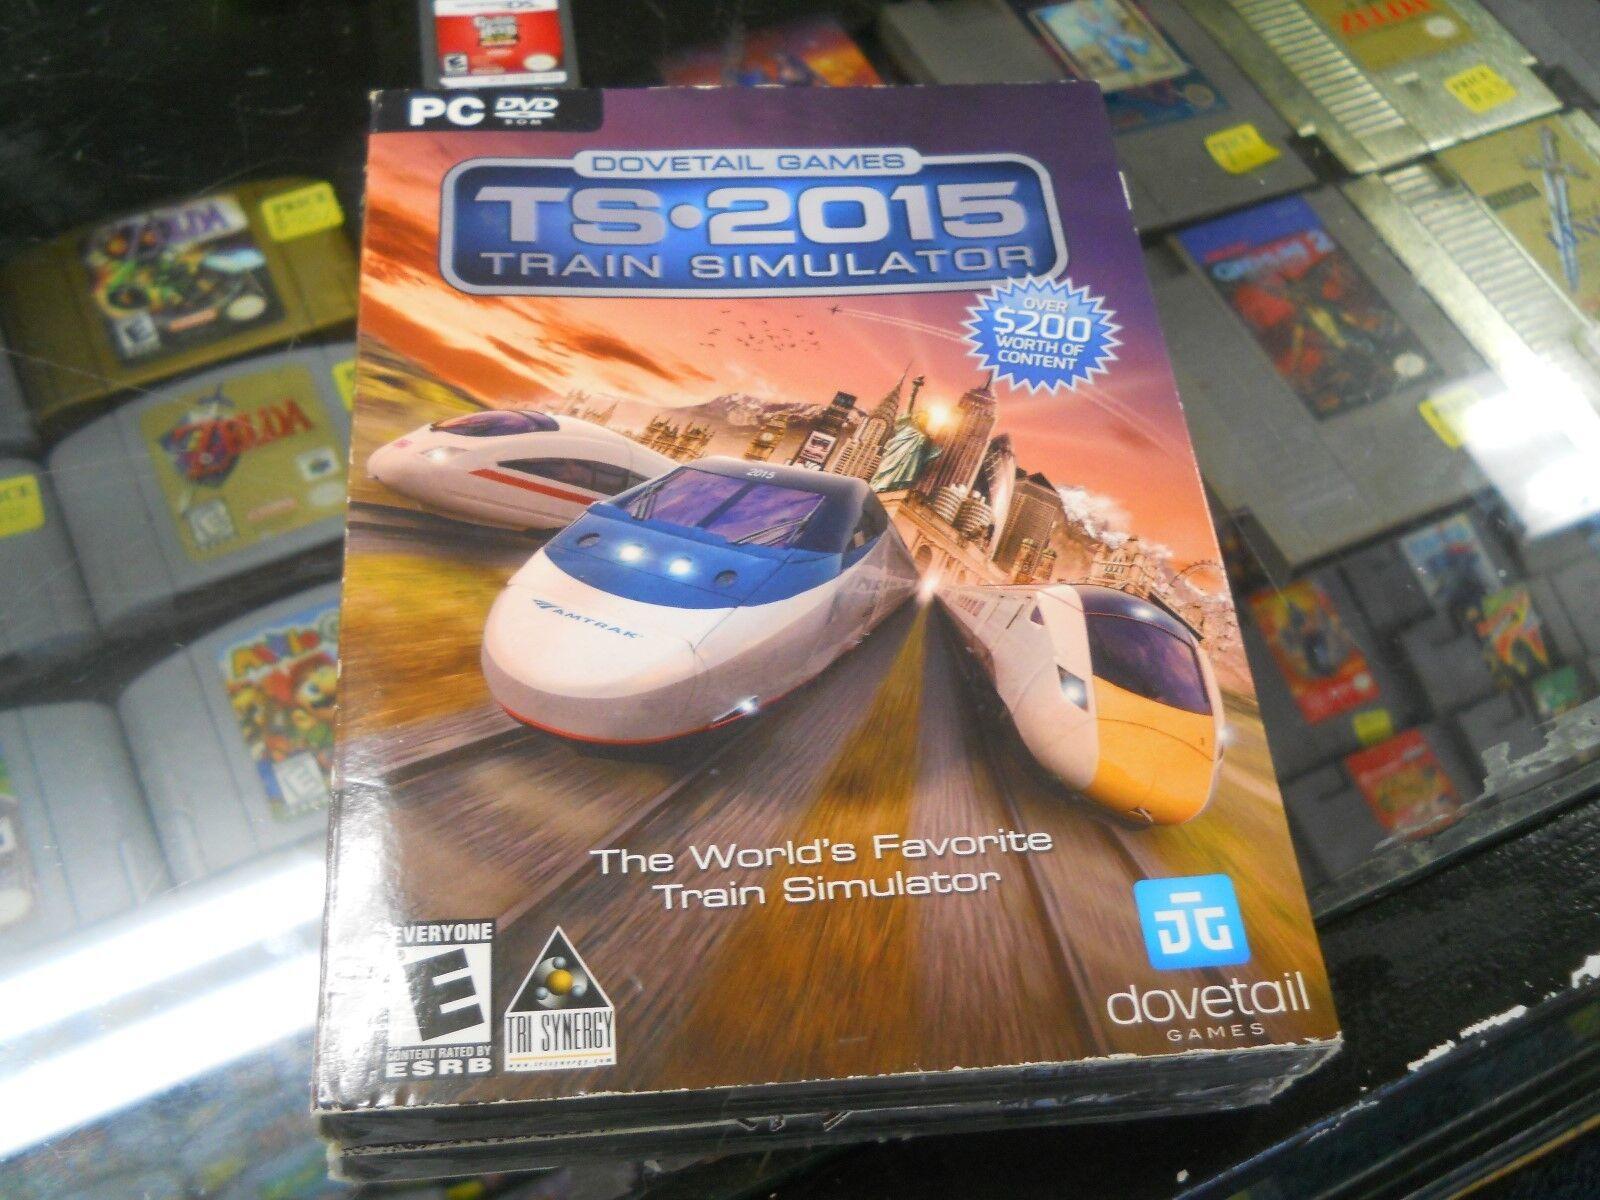 Dovetail Games Train Simulator TS - 2015 PC DVD  ***NEW SEALED***